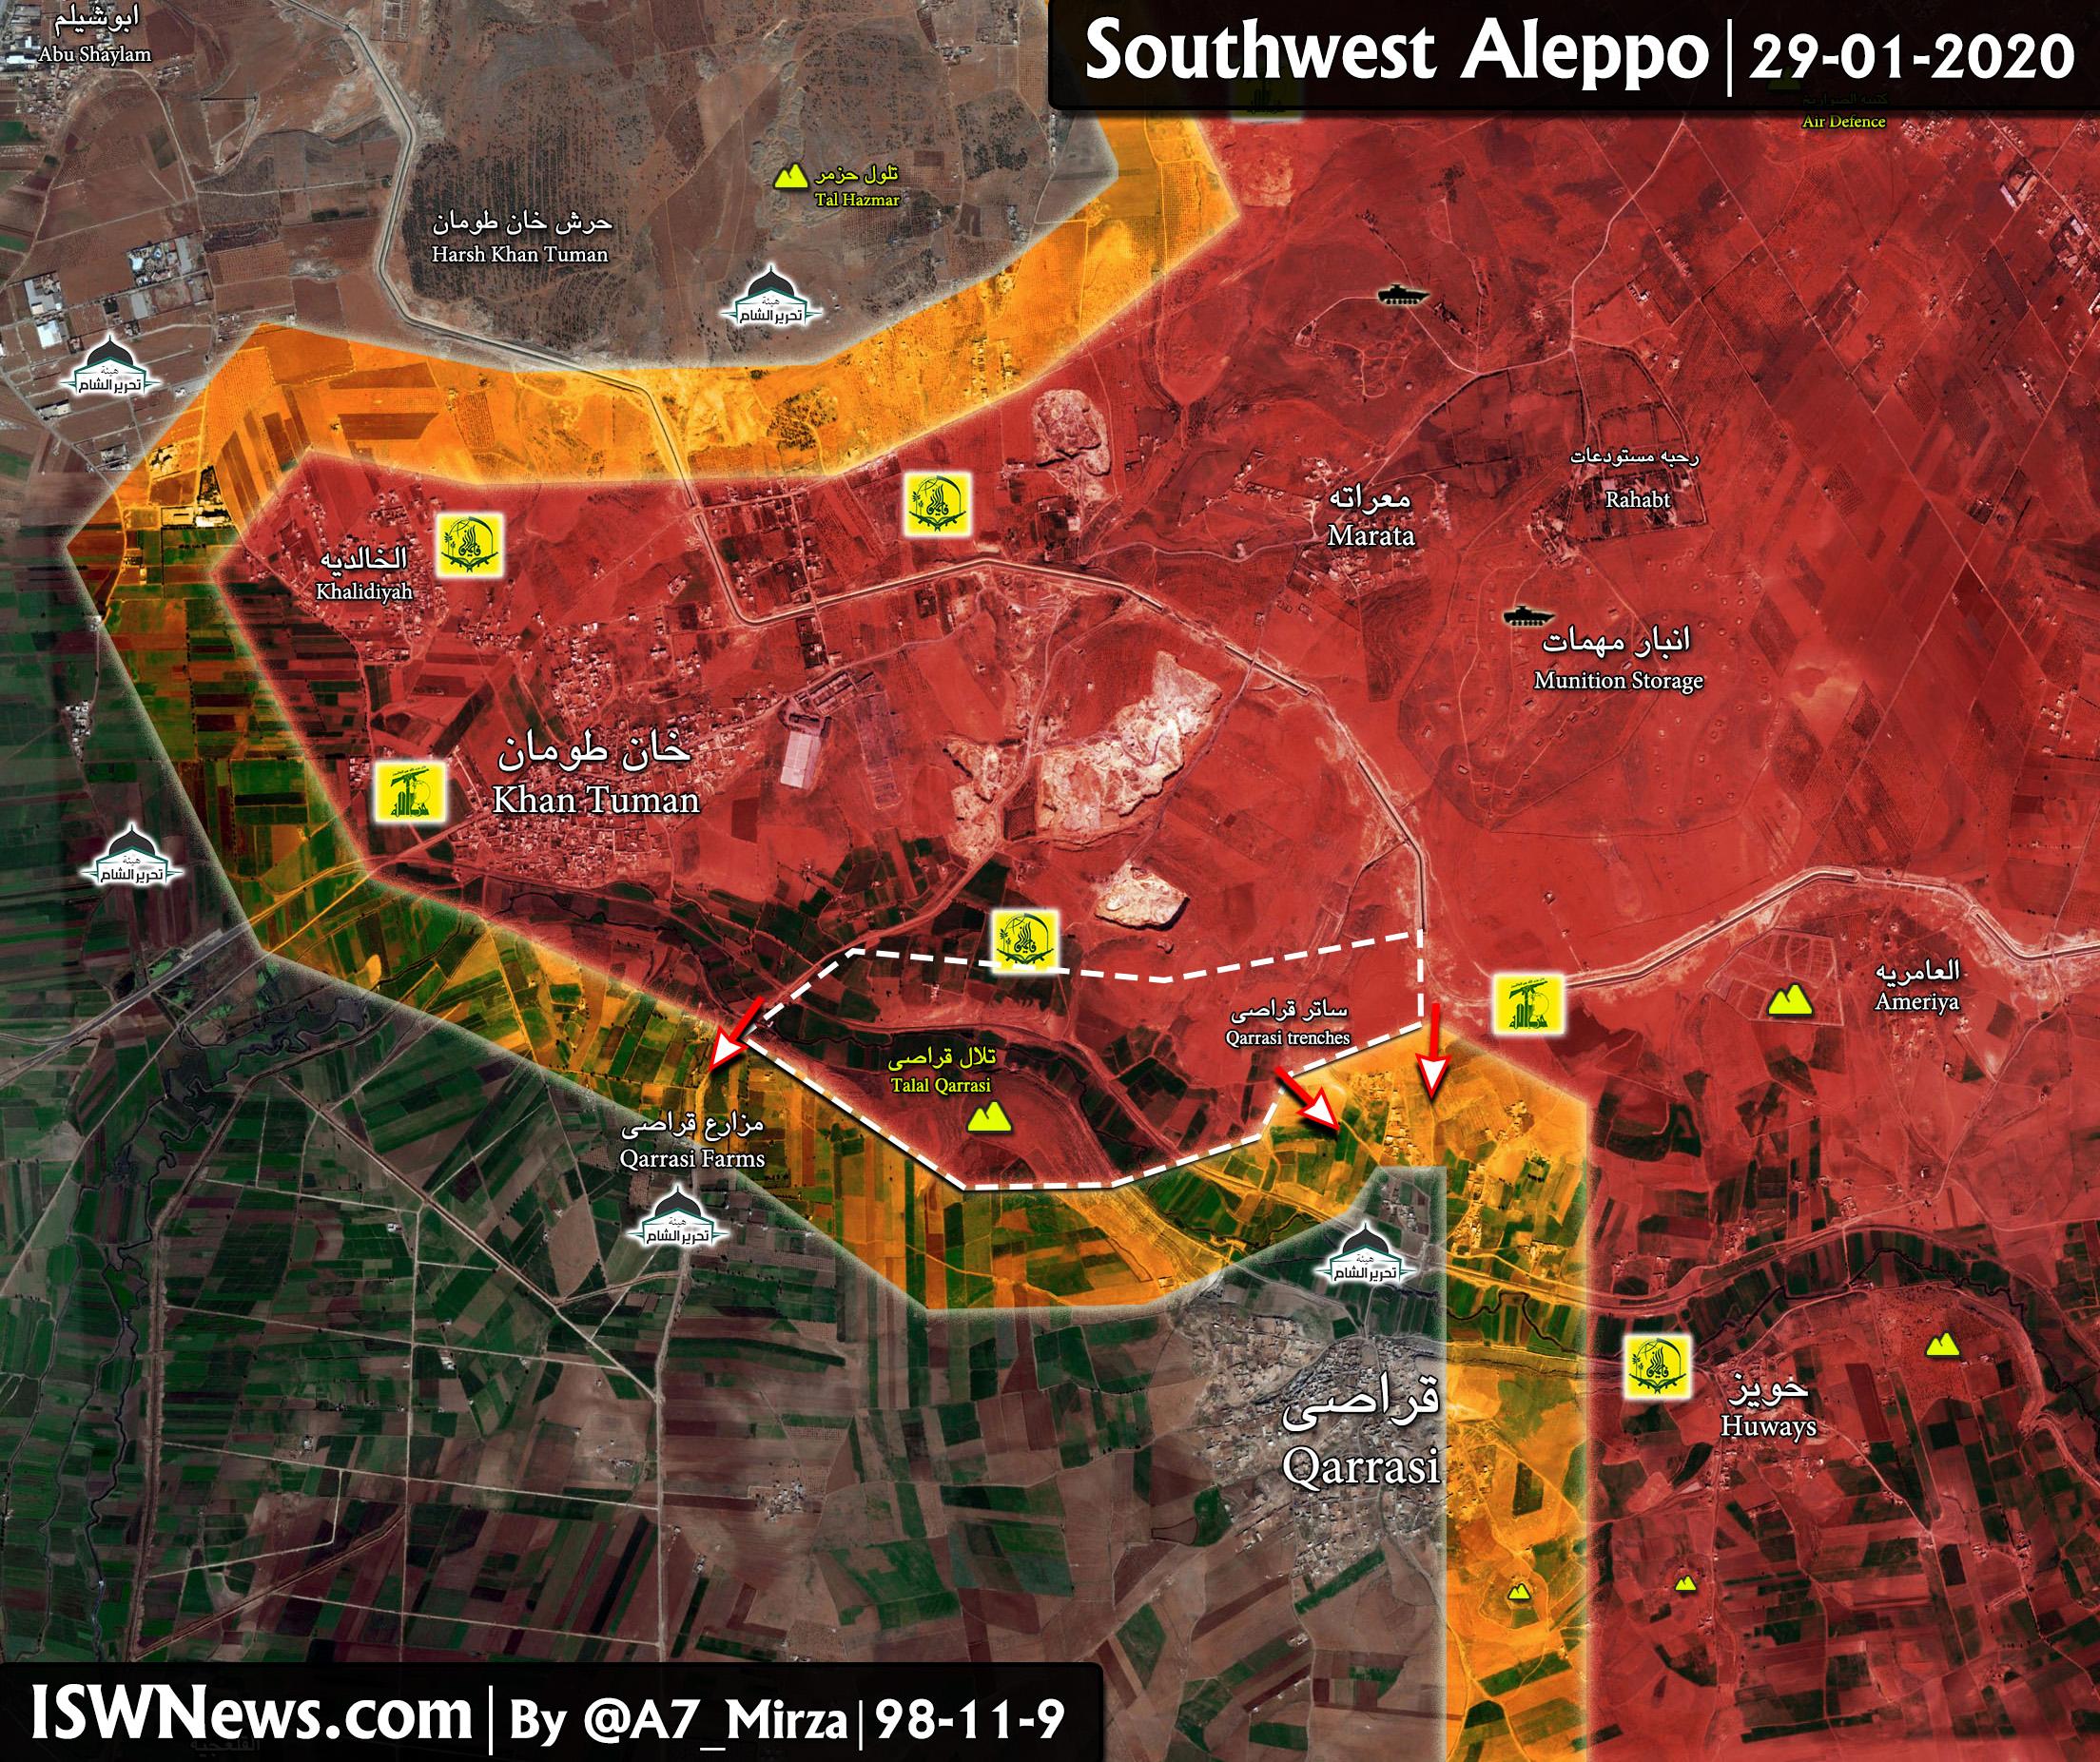 Syrian War: News #20 - Page 21 4-Aleppo-cut3-29jan98-9bah98-2-copy